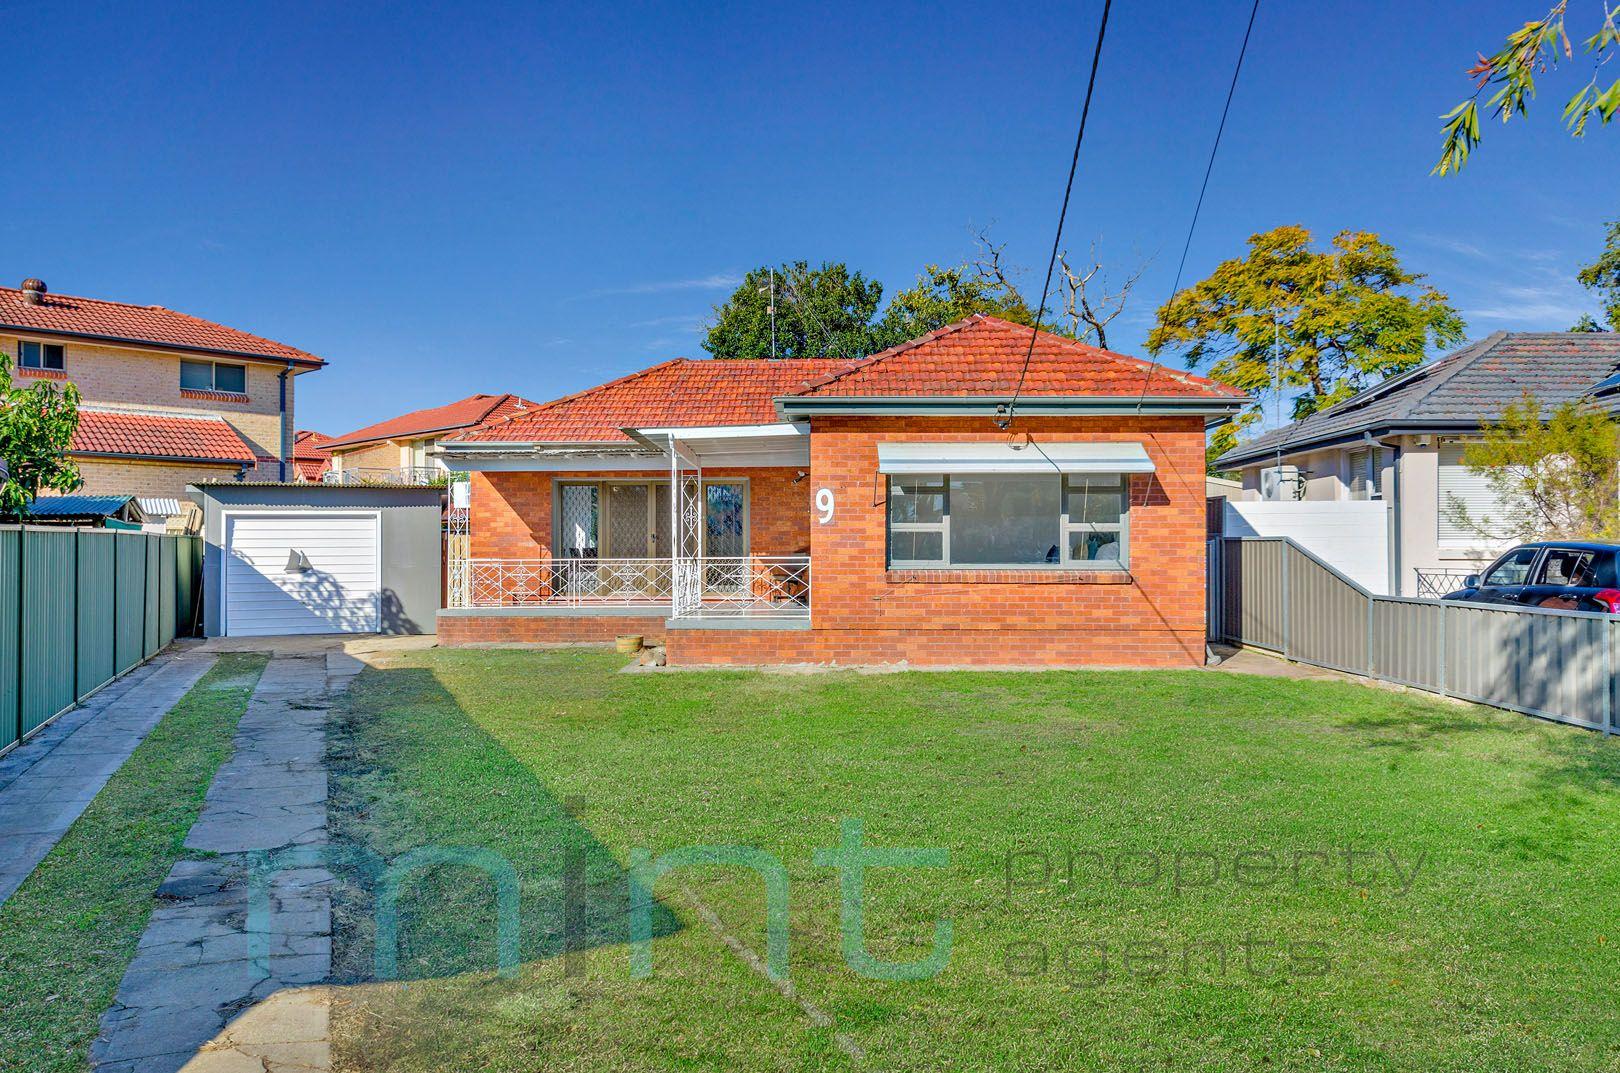 9 Parkview  Avenue, Belfield NSW 2191, Image 0